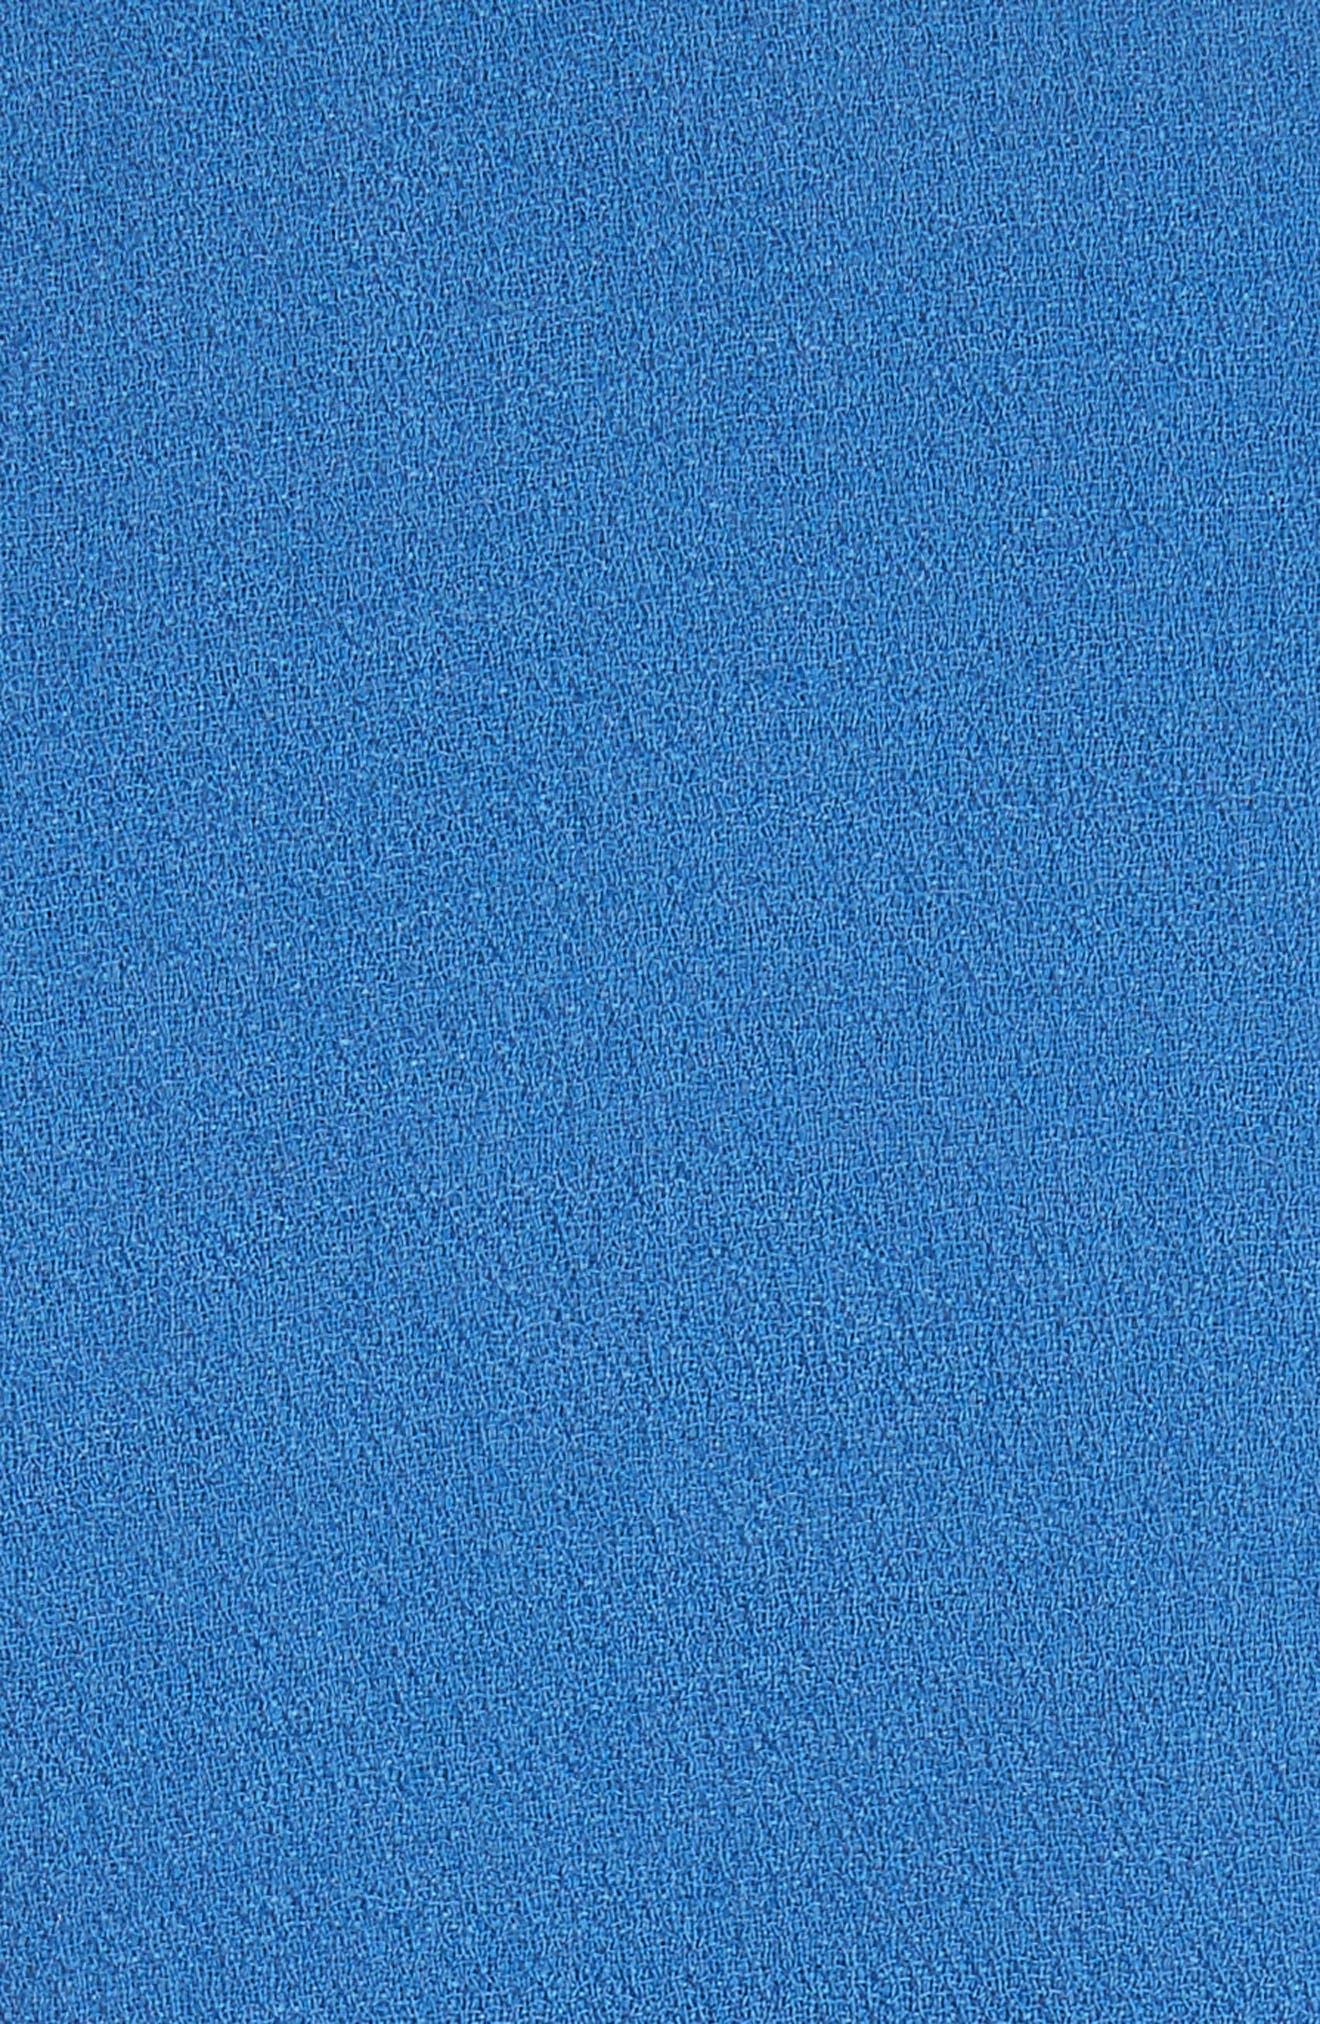 Stretch Wool Sheath Dress,                             Alternate thumbnail 6, color,                             Ocean